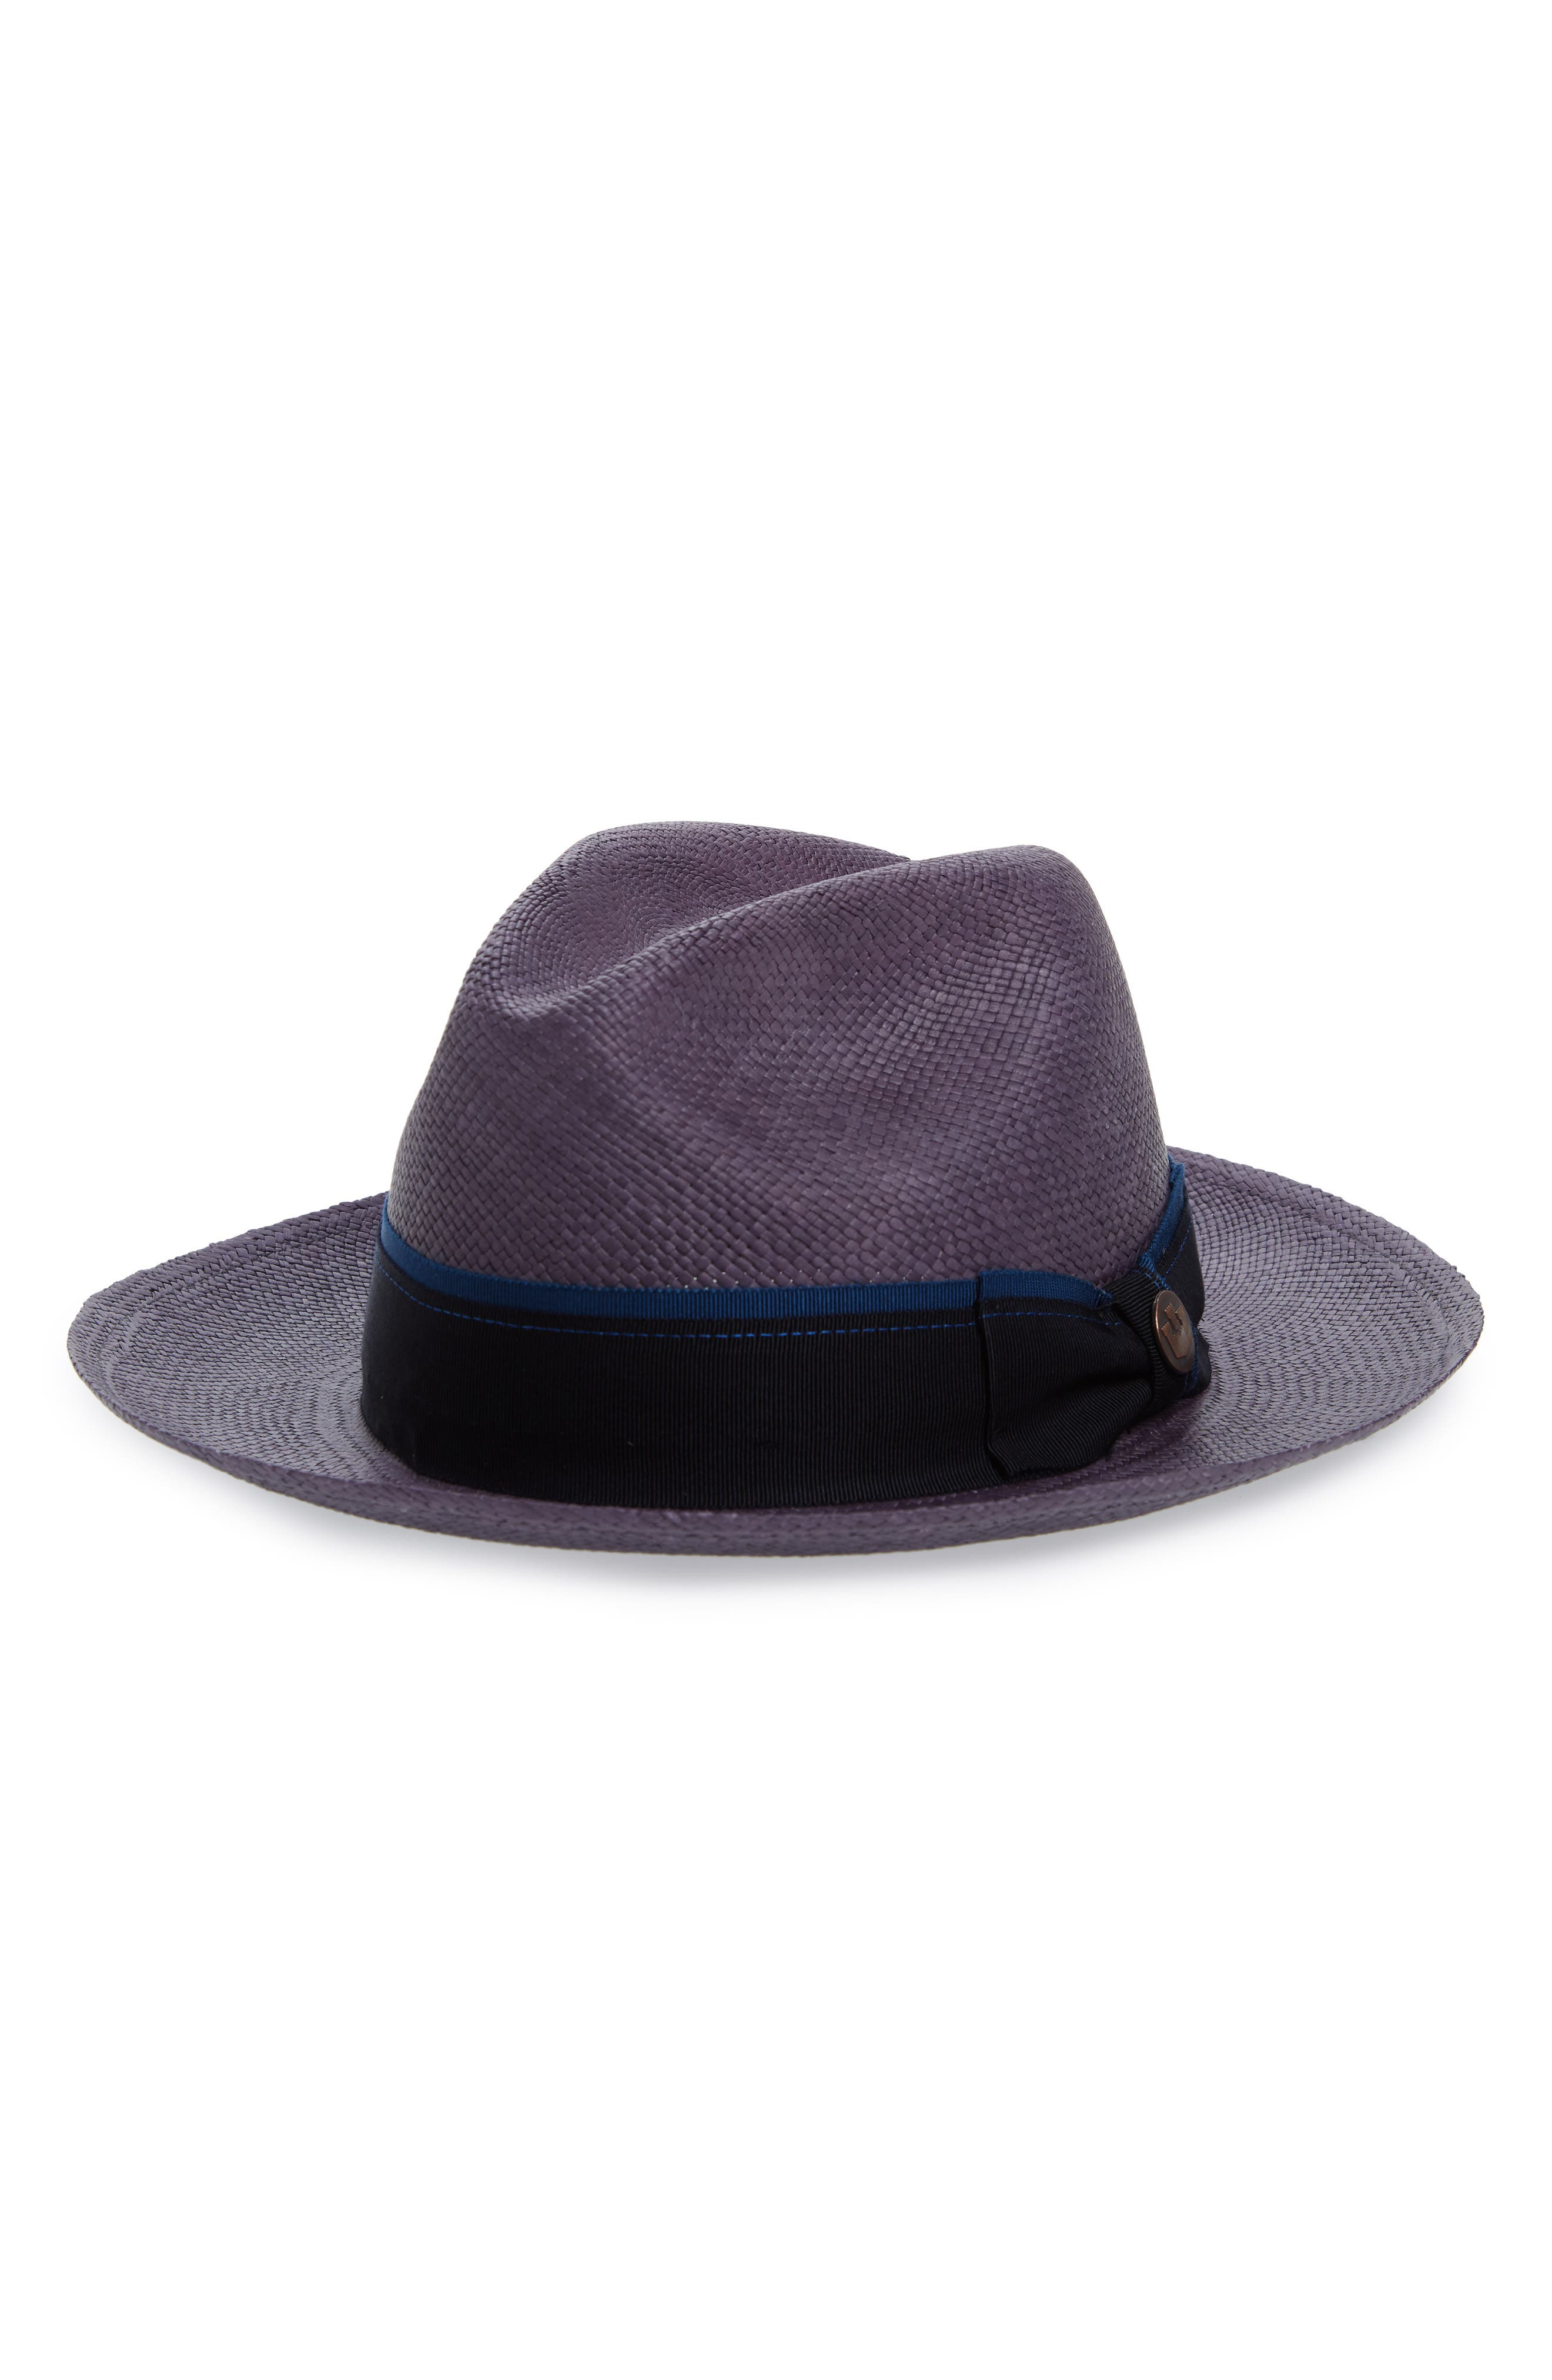 39b11cfdd7bbc goorin bros. fedoras hats for men - Buy best men's goorin bros ...